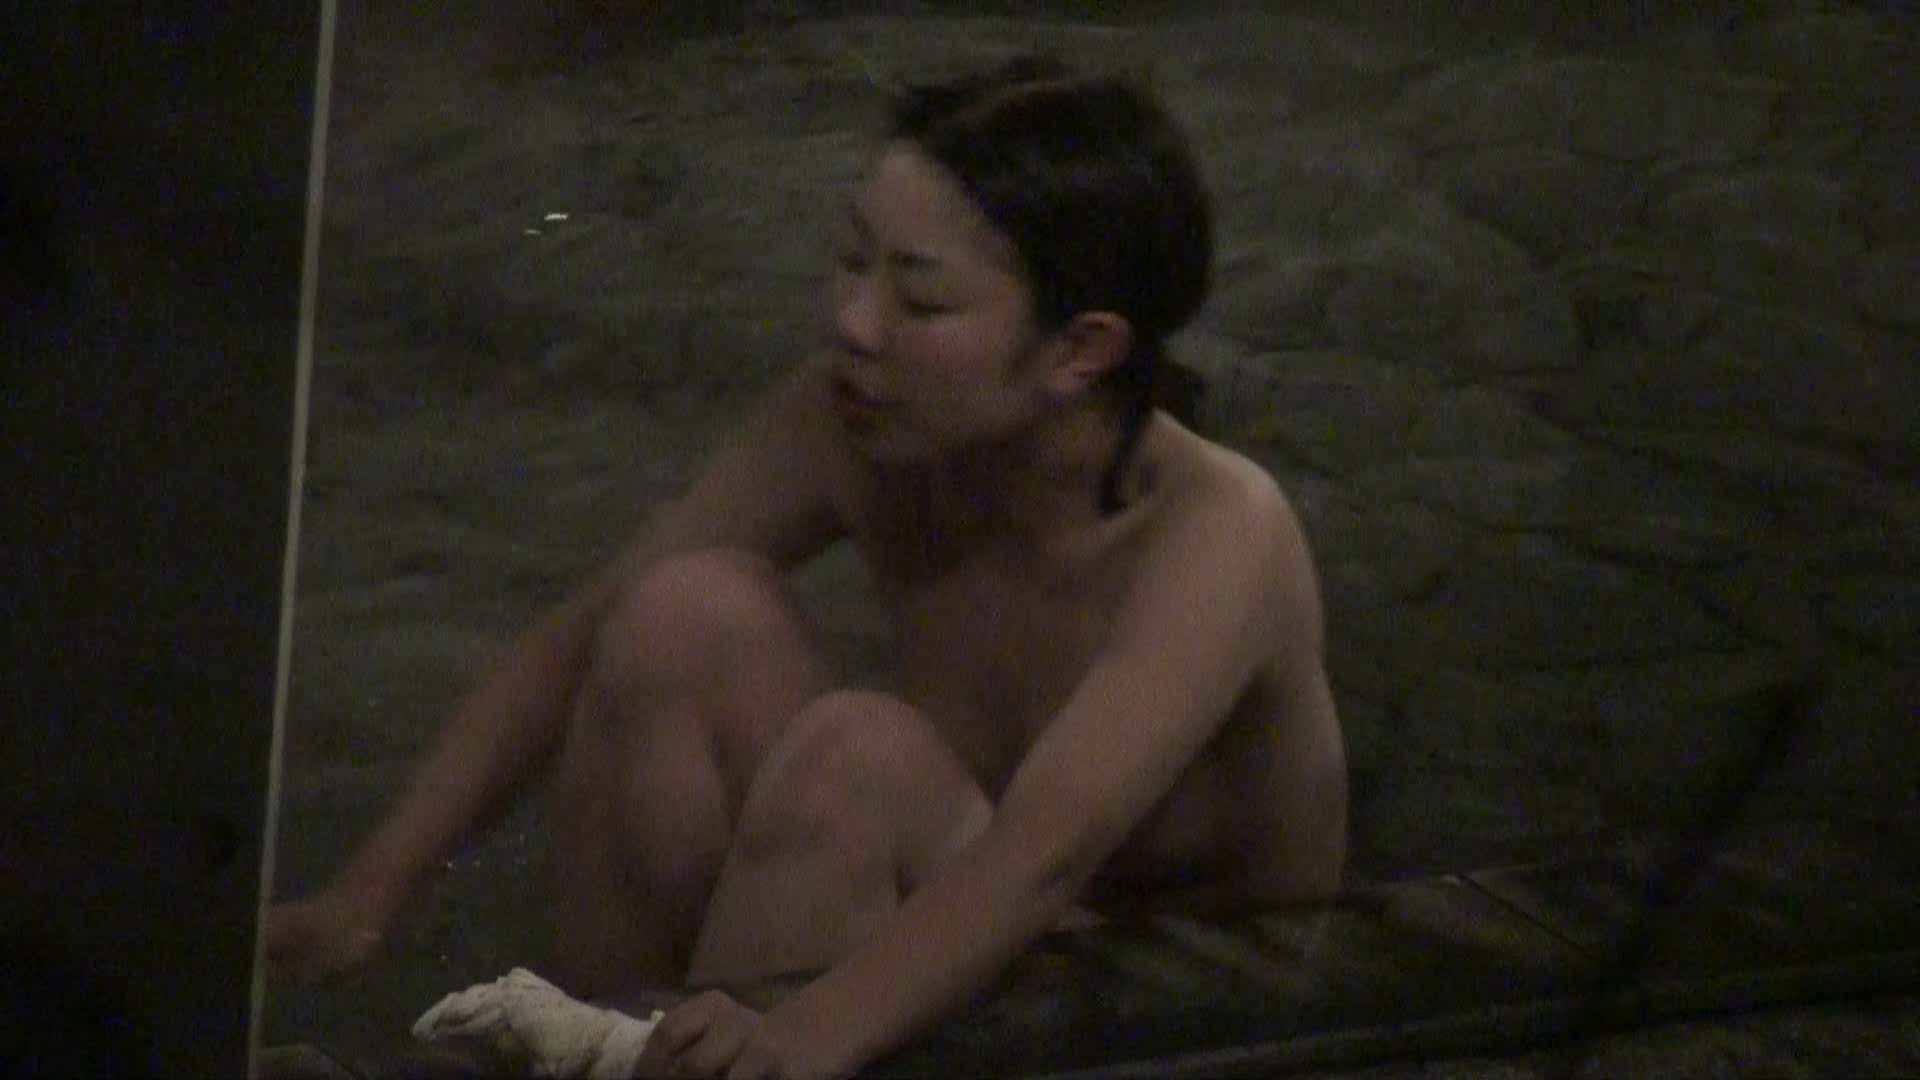 Aquaな露天風呂Vol.330 OLのエロ生活 | 露天風呂  101連発 7